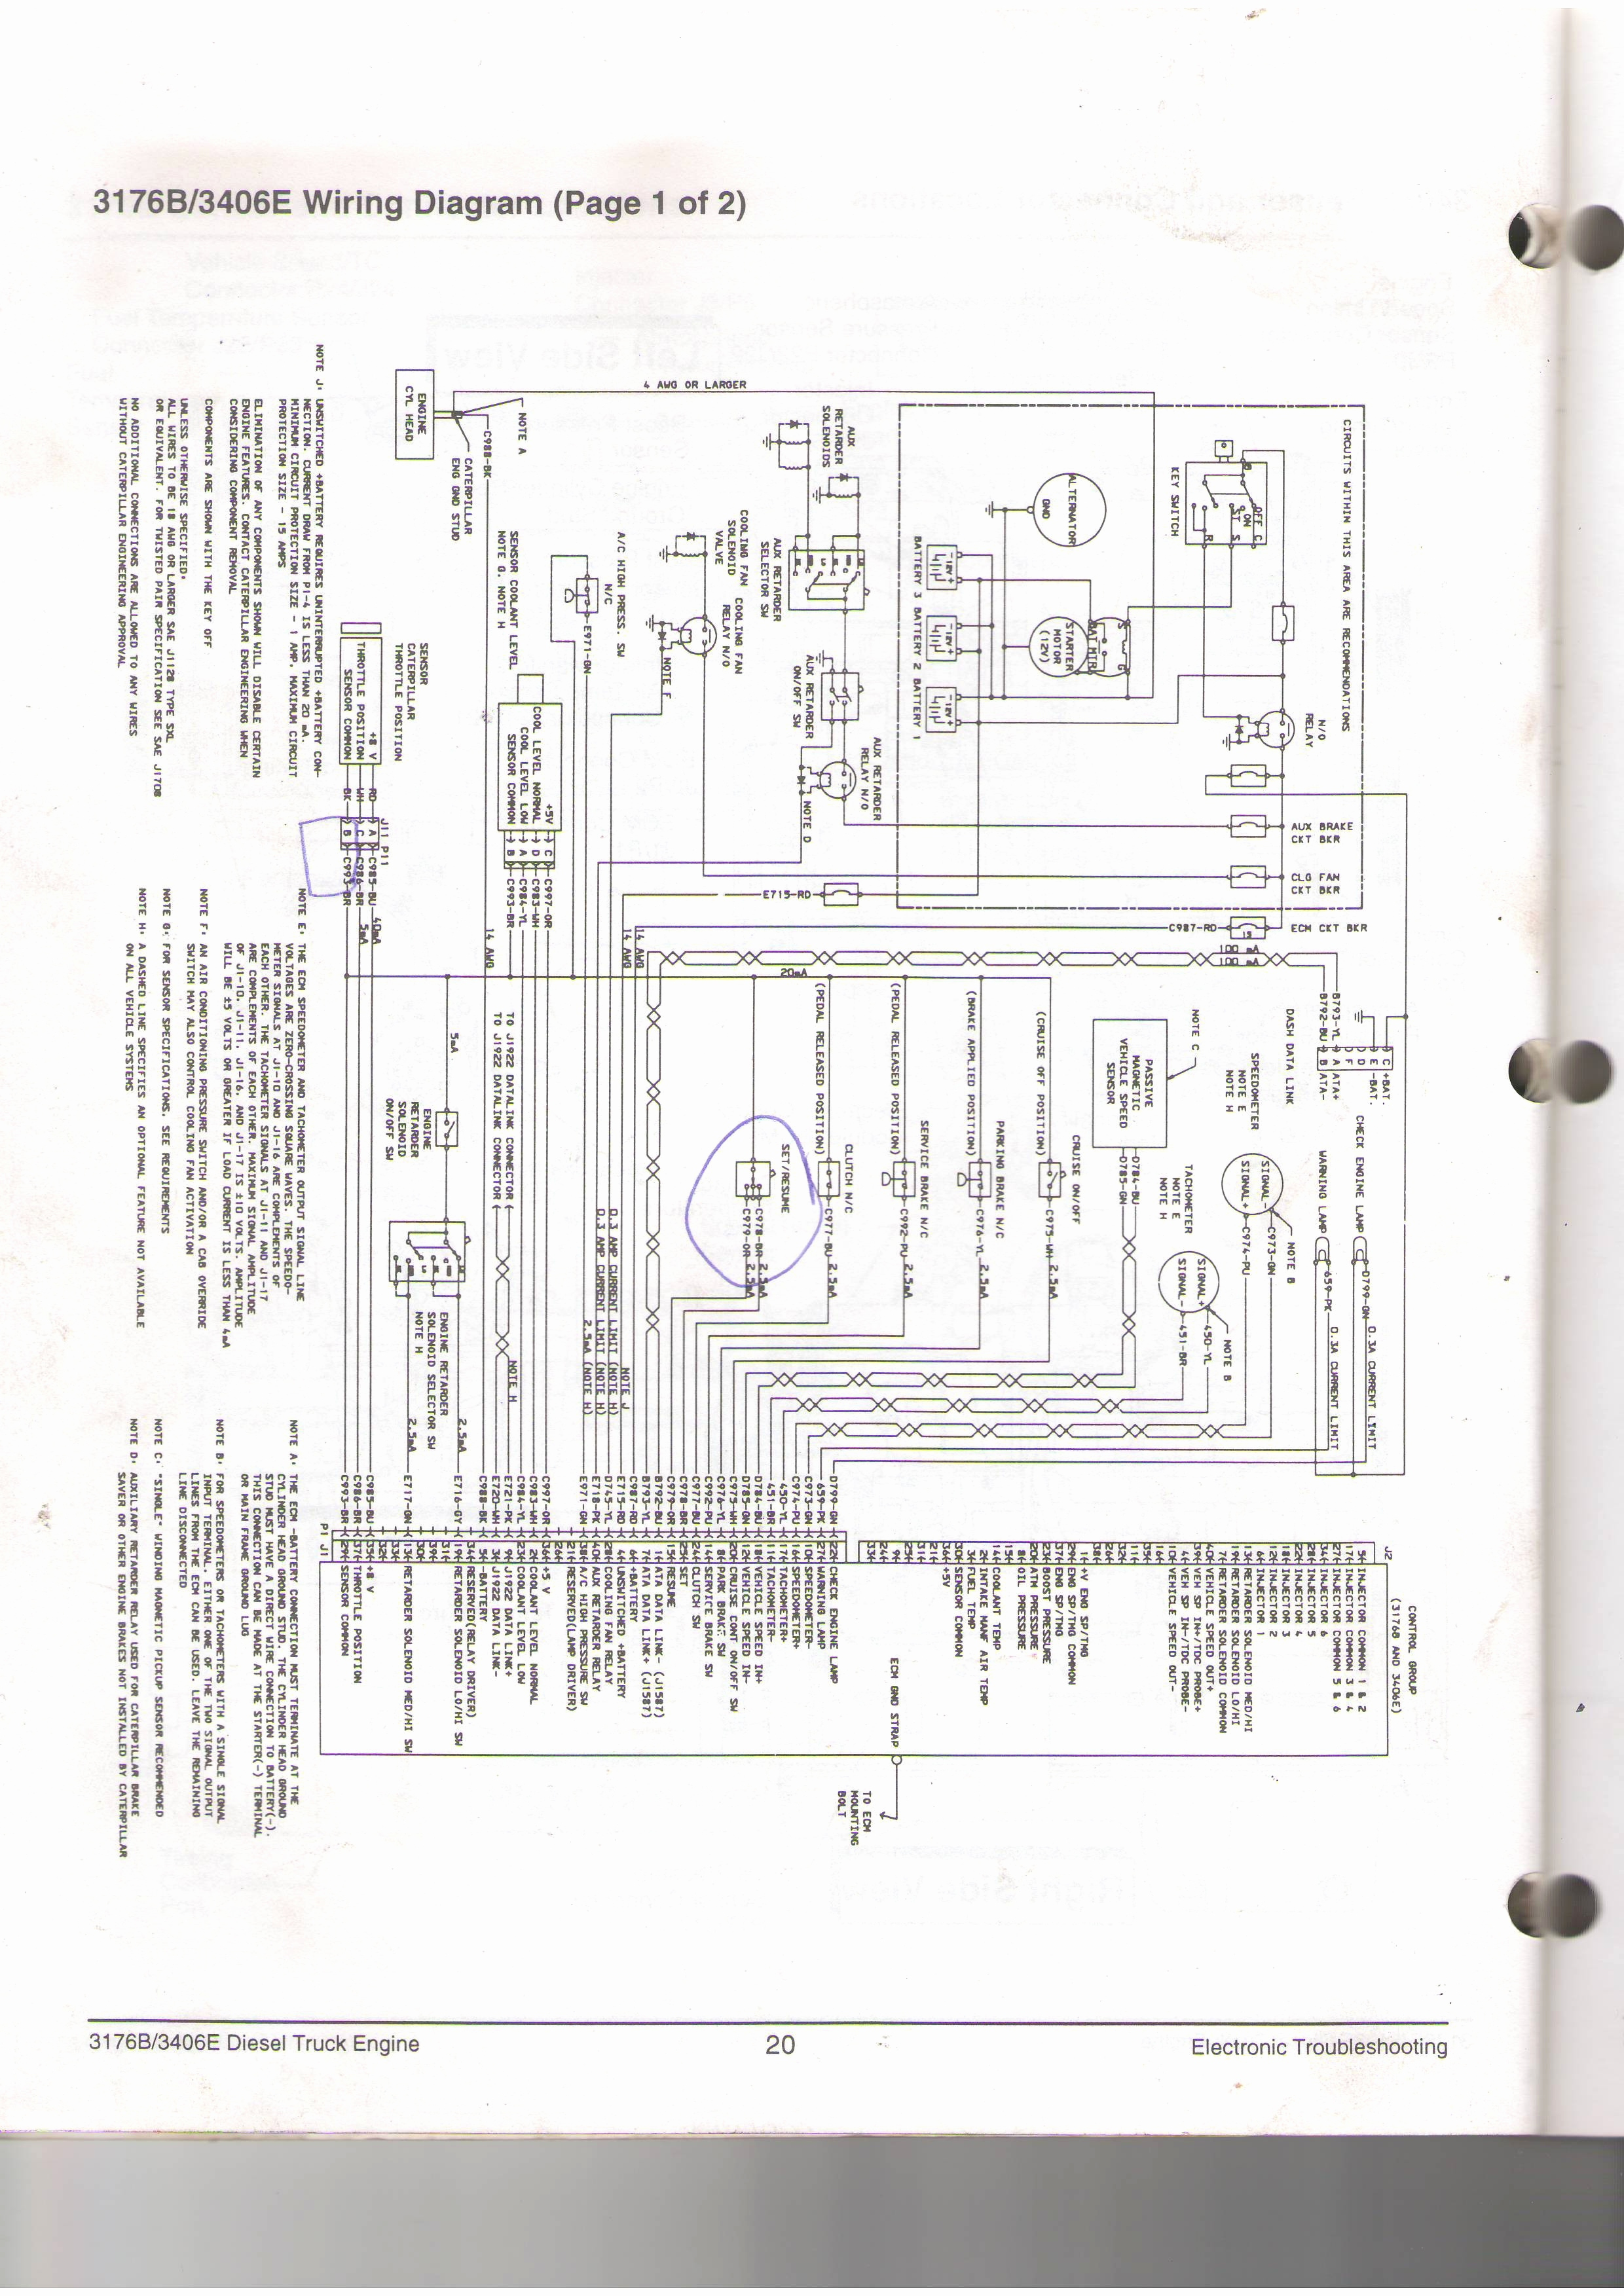 Cat Ecm Pin Wiring Diagram 70 C10 | Wiring Library - Cat 70 Pin Ecm Wiring Diagram